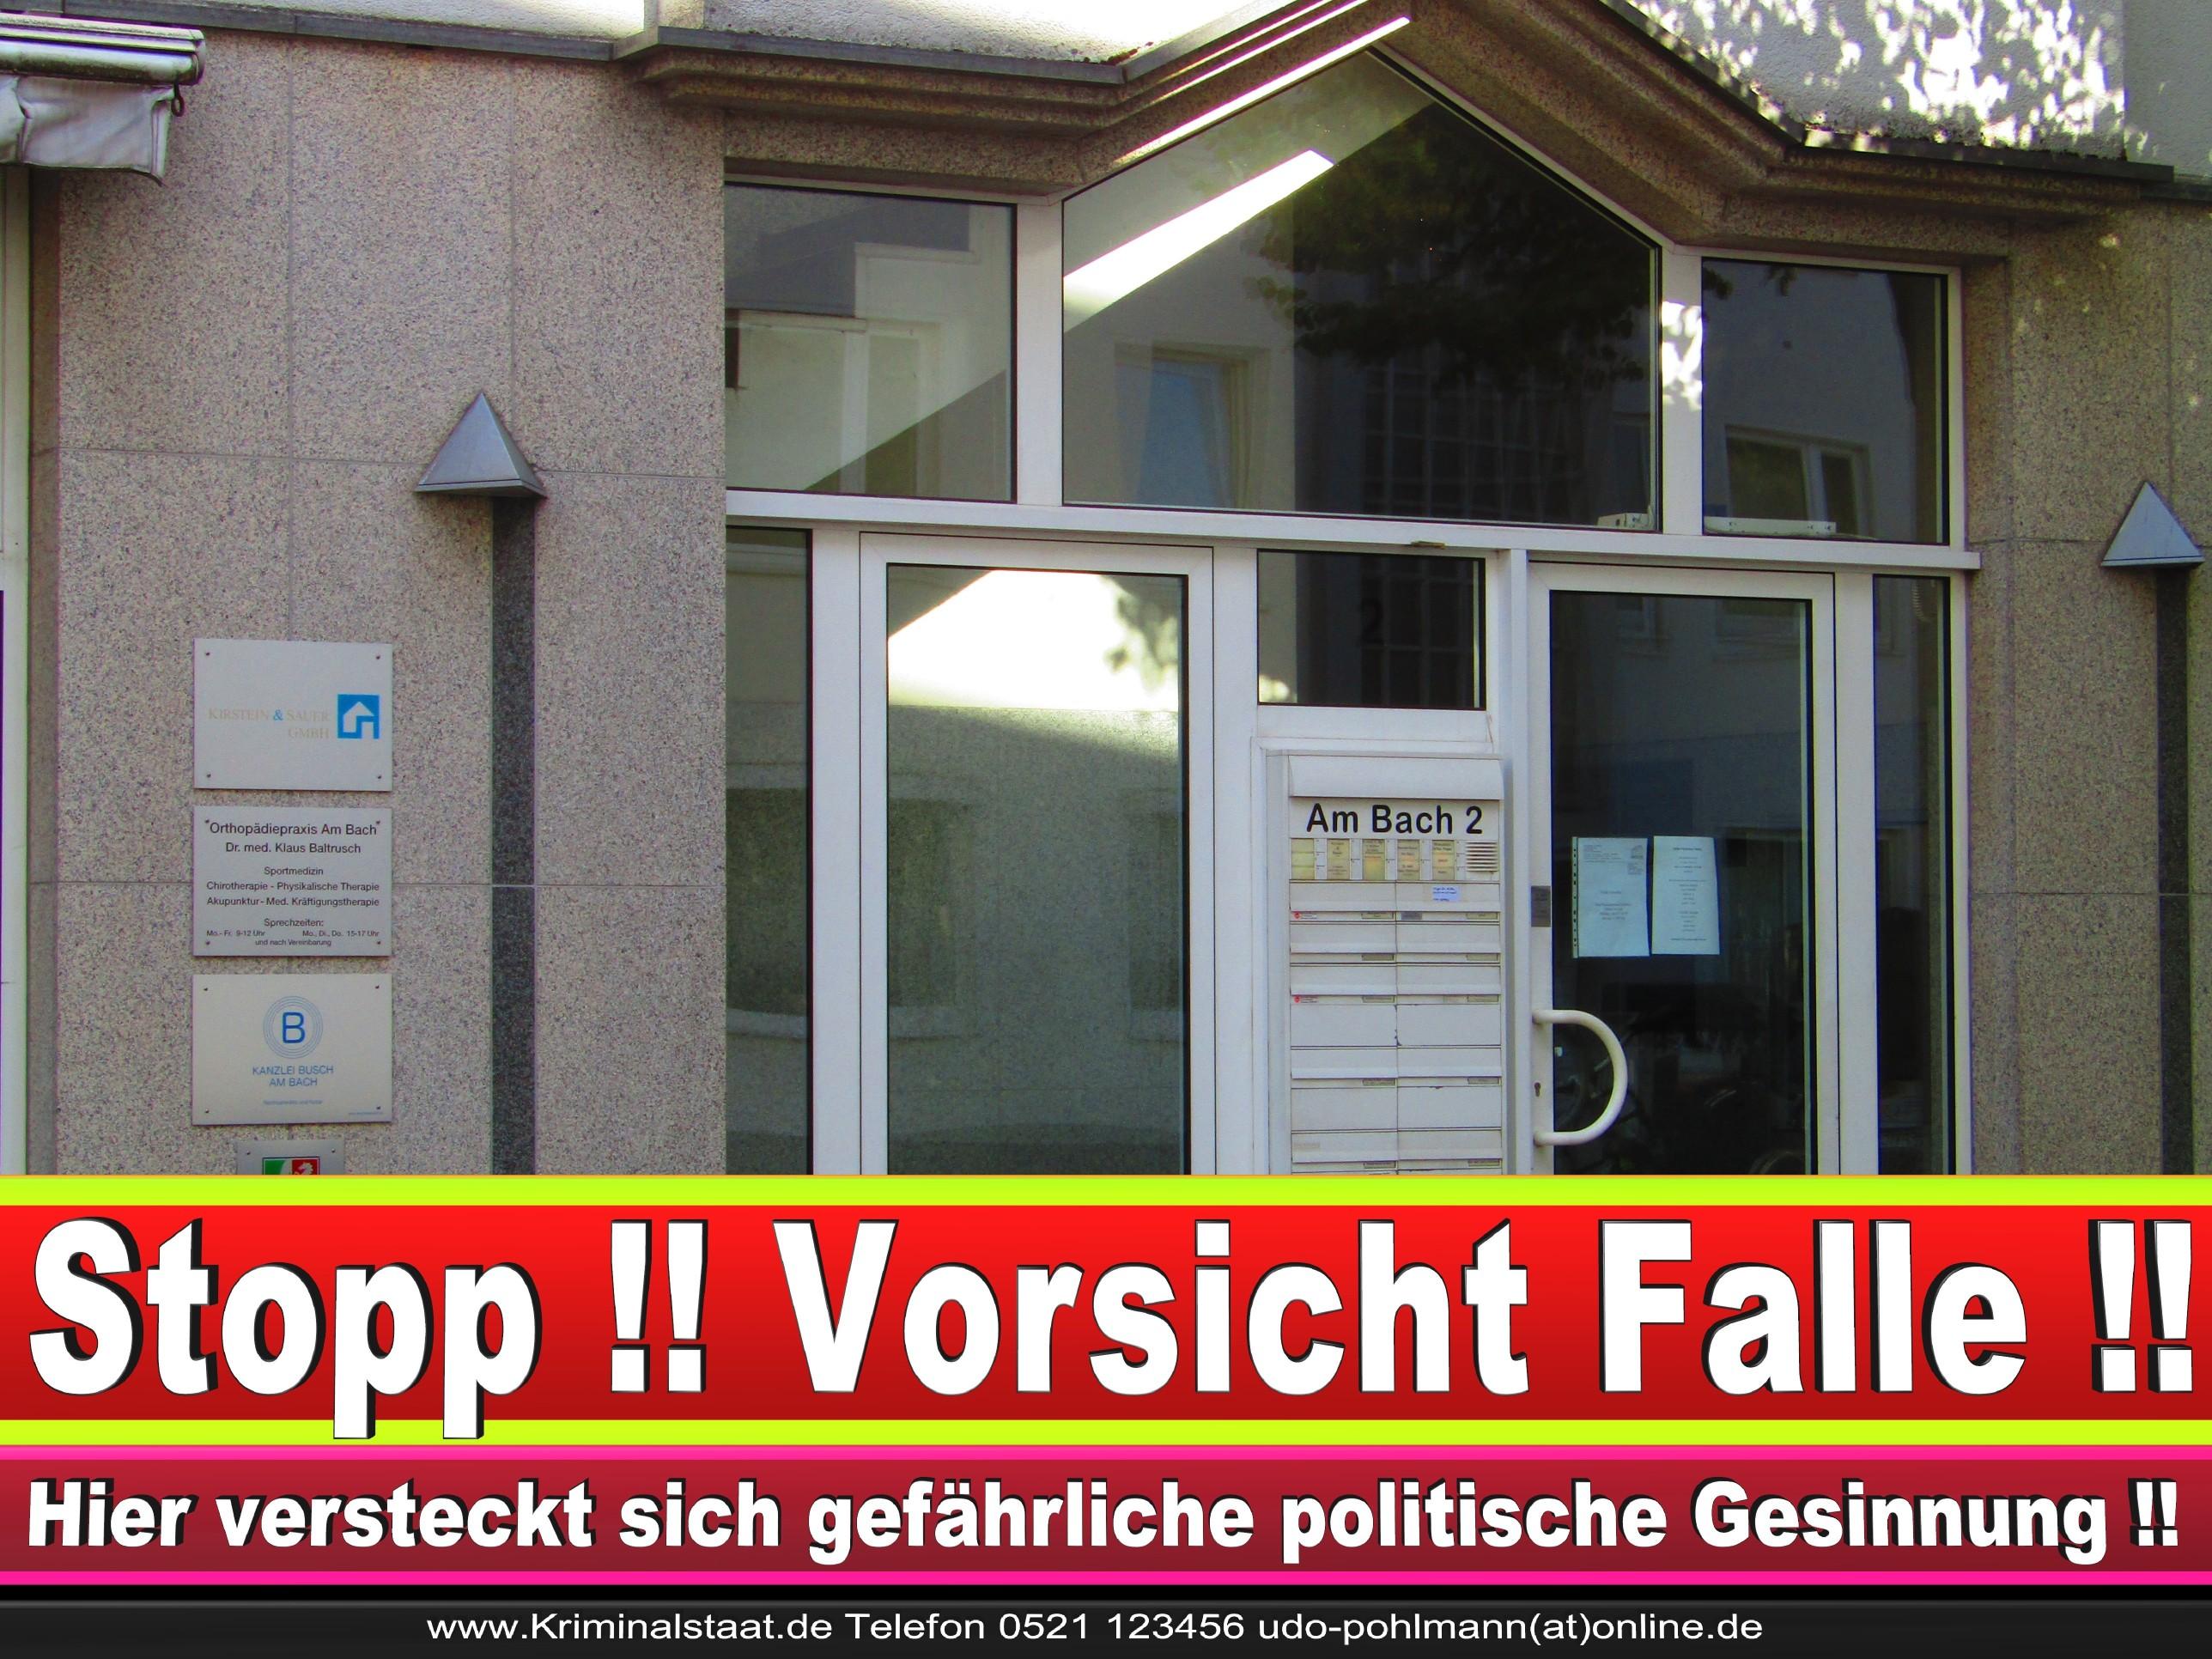 Rechtsanwältin Amelie Busch Am Bach 2 Bielefeld CDU 10